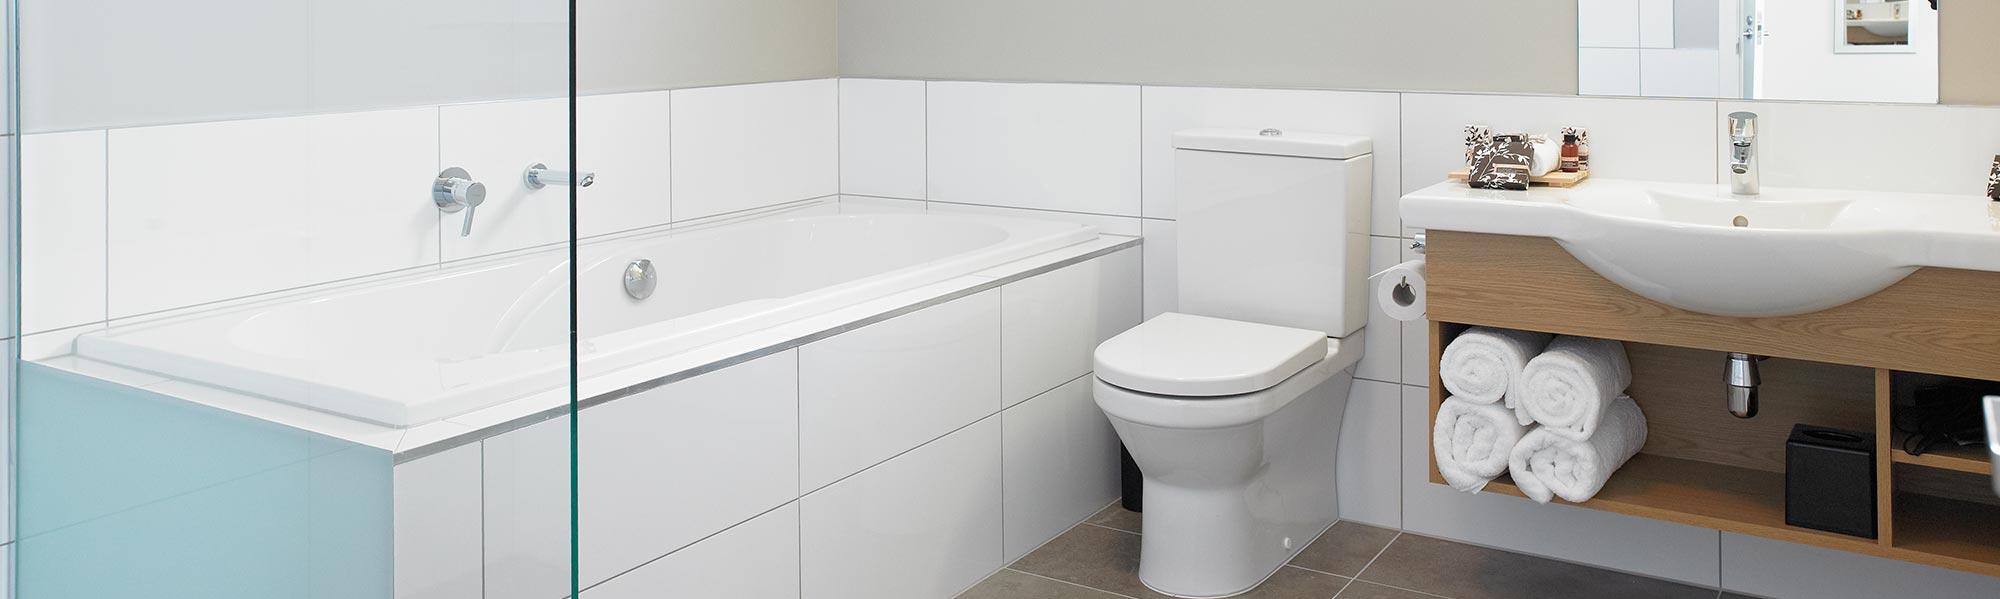 banner-image-bathroom.jpg